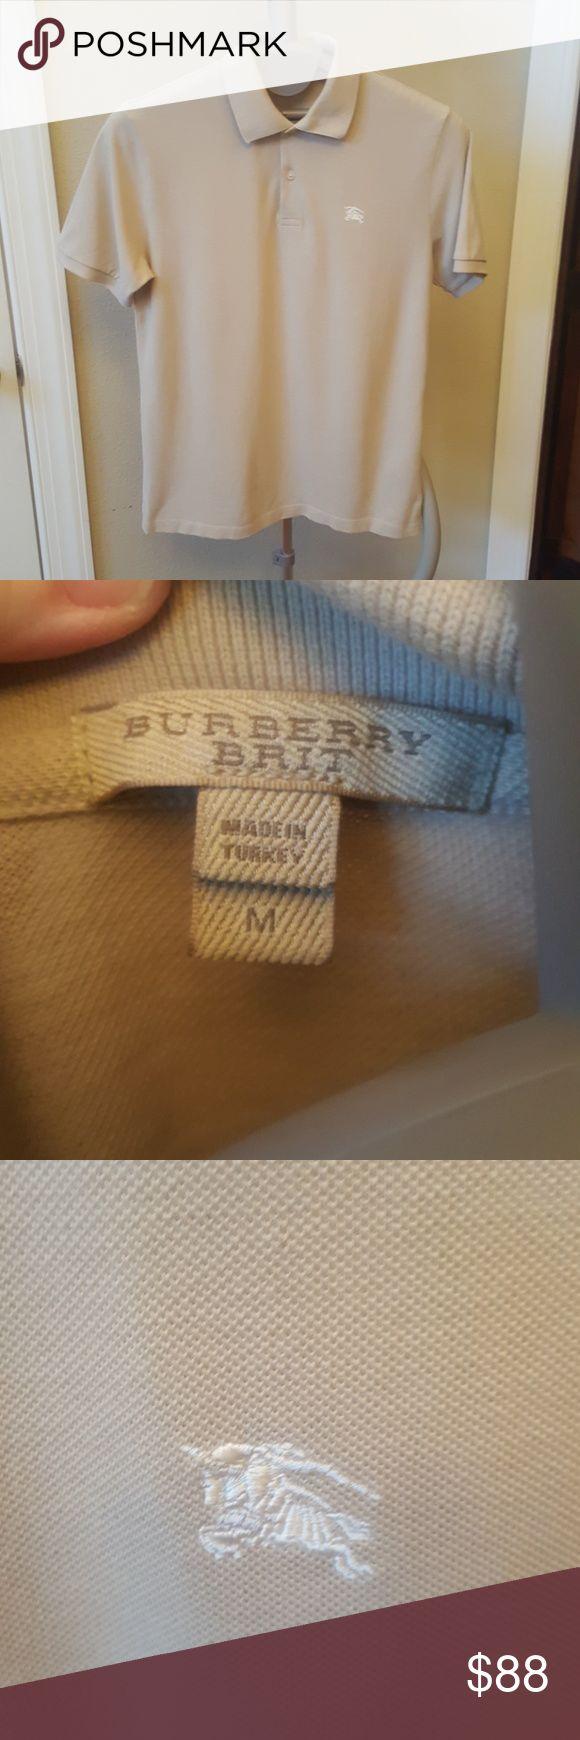 Burberry men's tan shirt Sz Medium Burberry men's tan shirt size Medium, great condition Burberry Shirts Polos